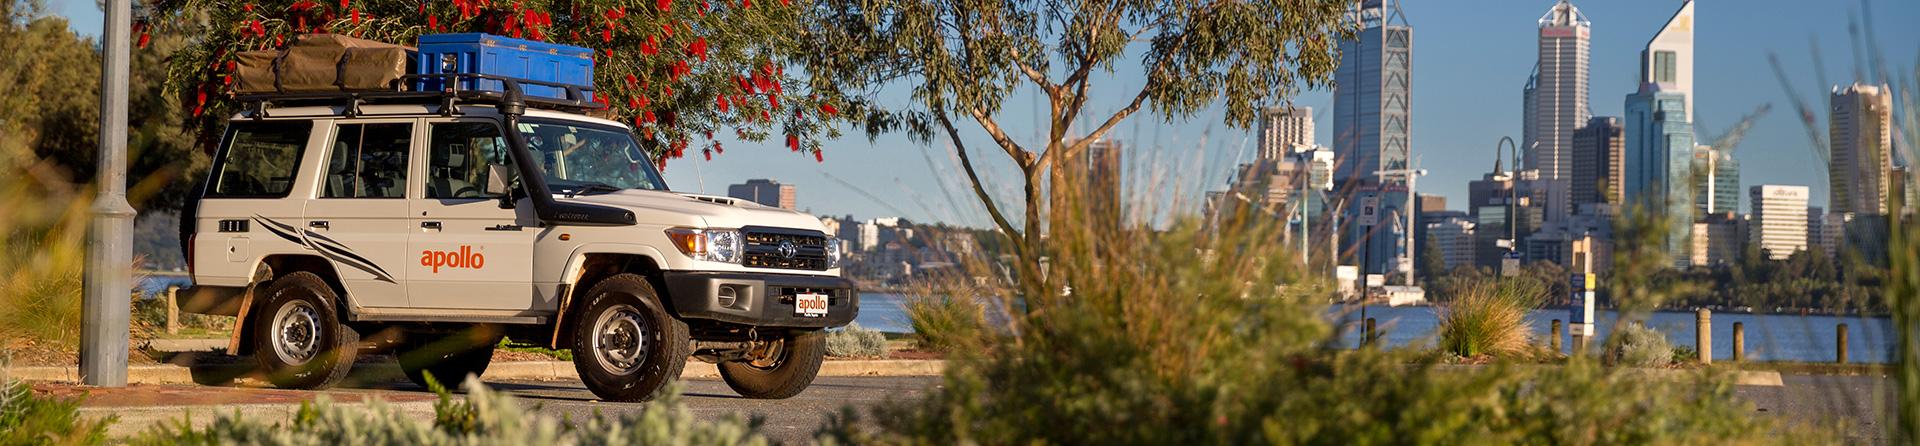 Apollo-4WD-Overlander-Australië